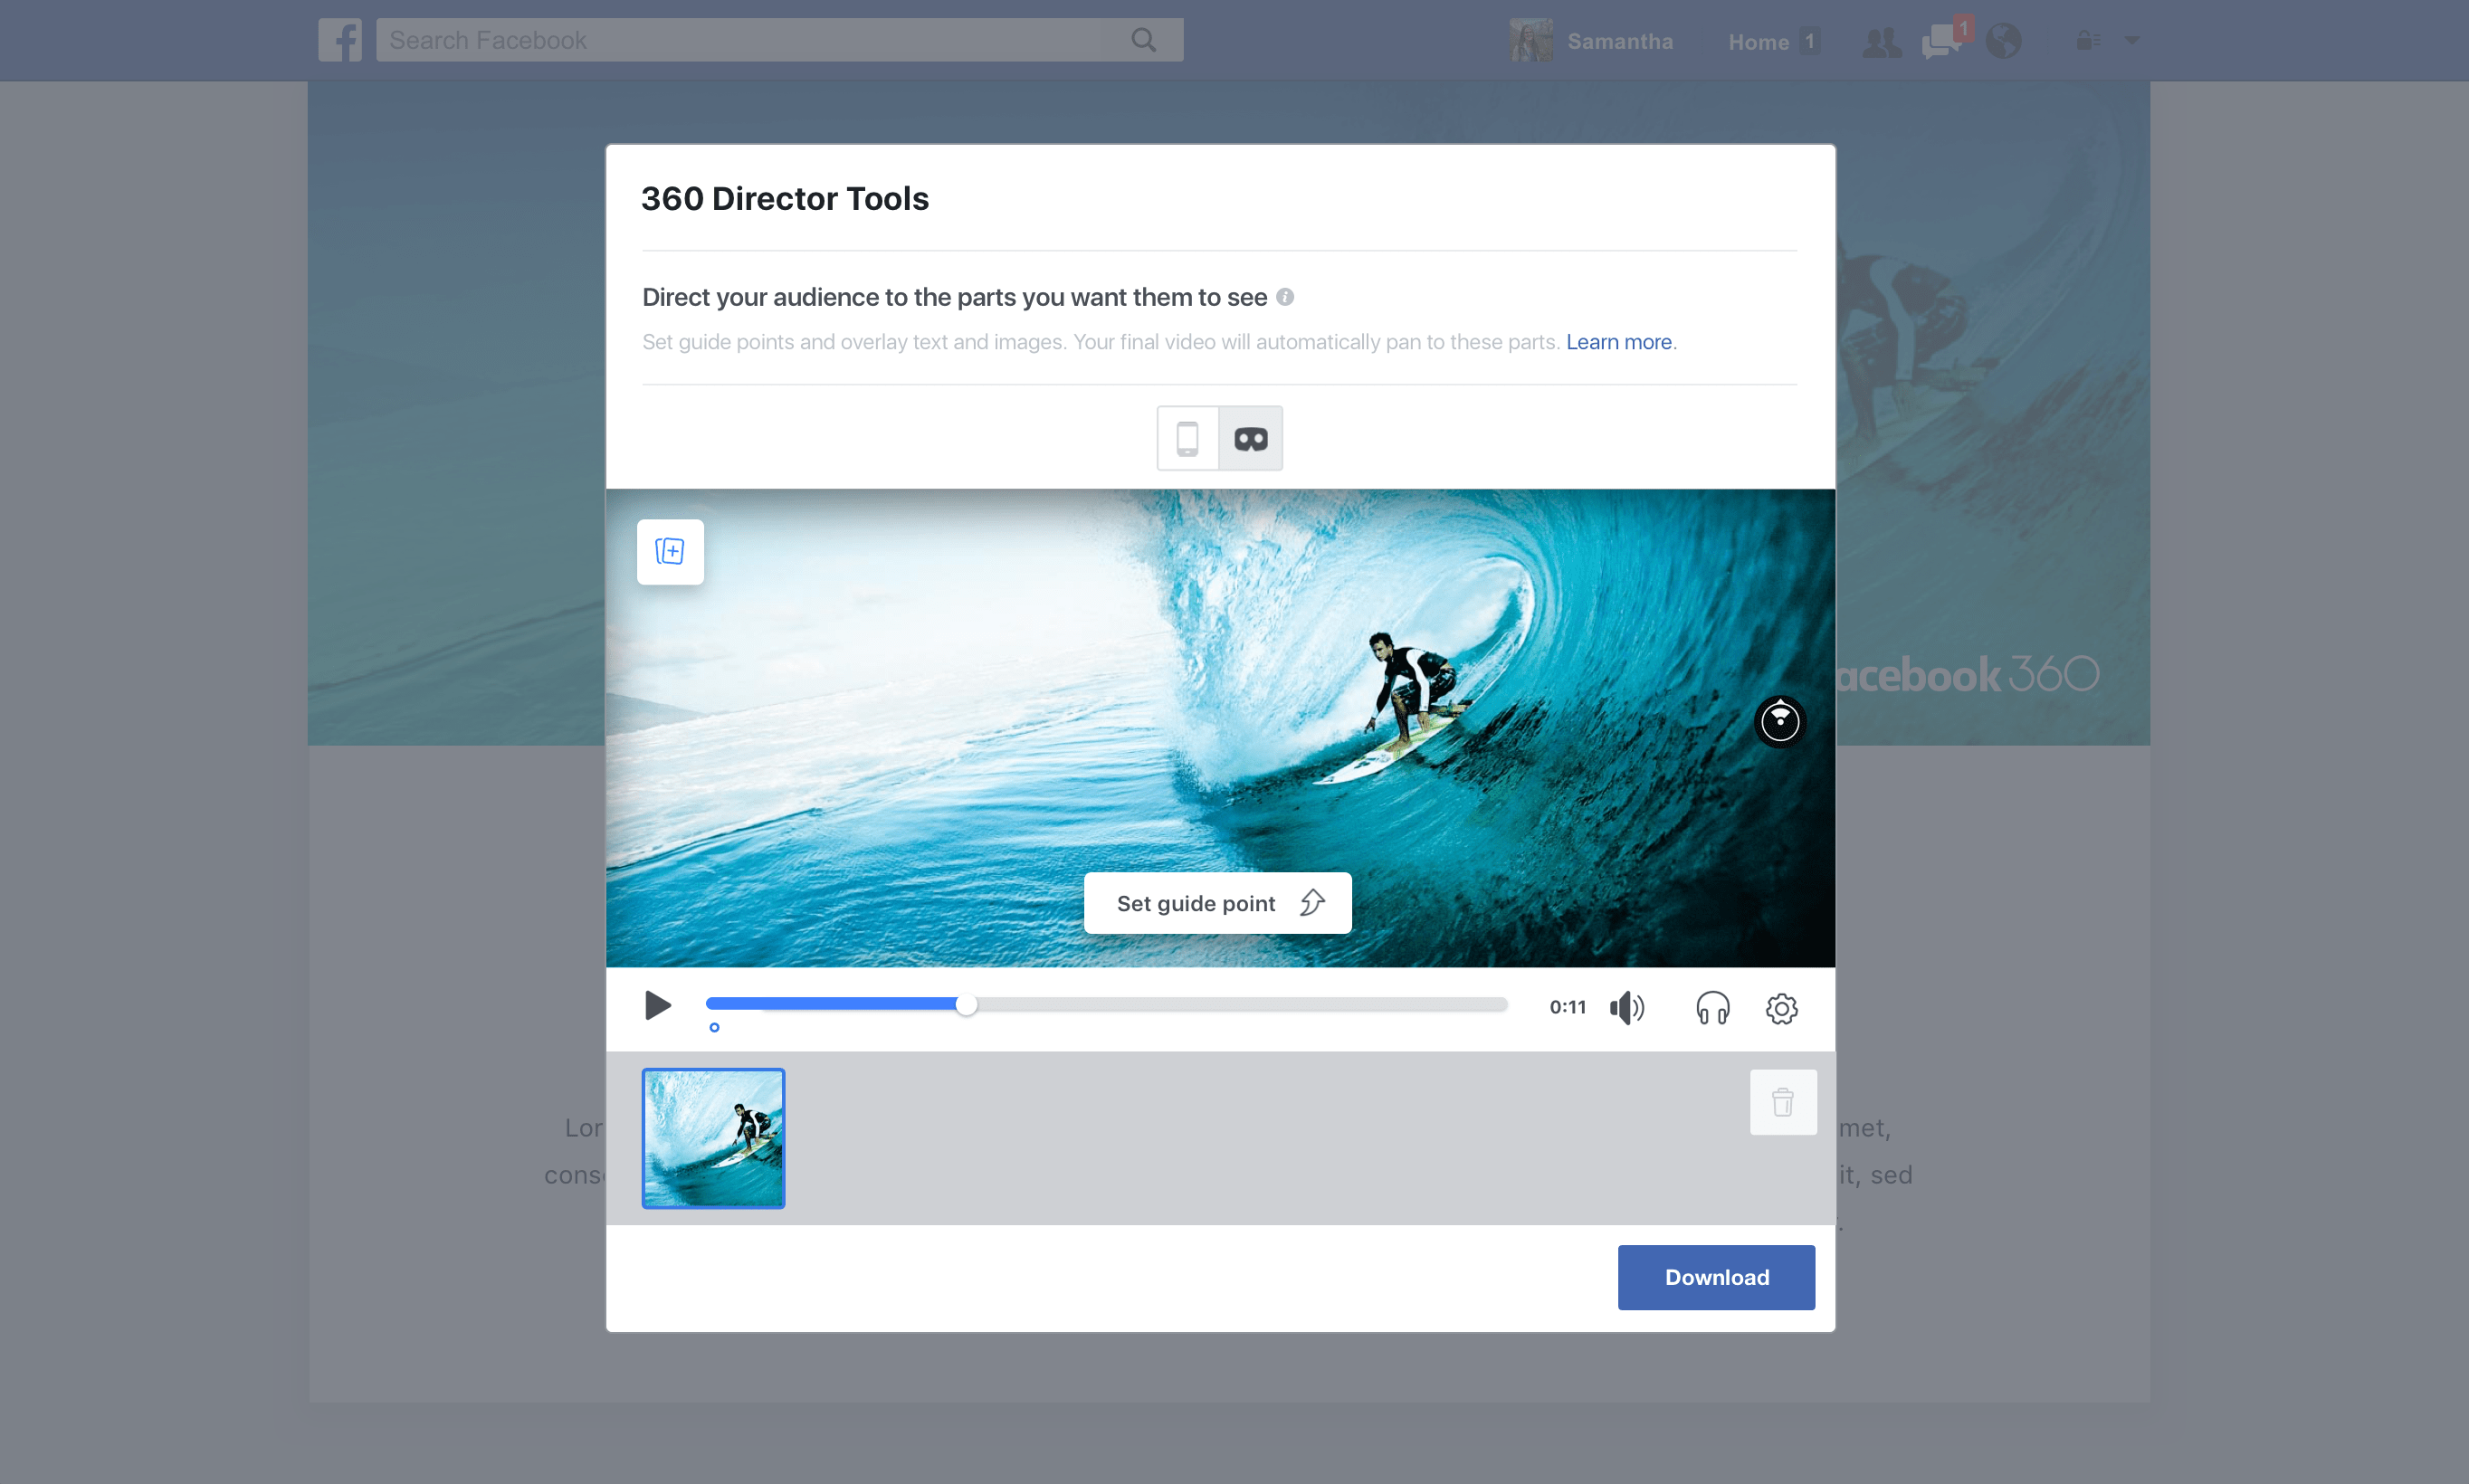 facebook 360 Director